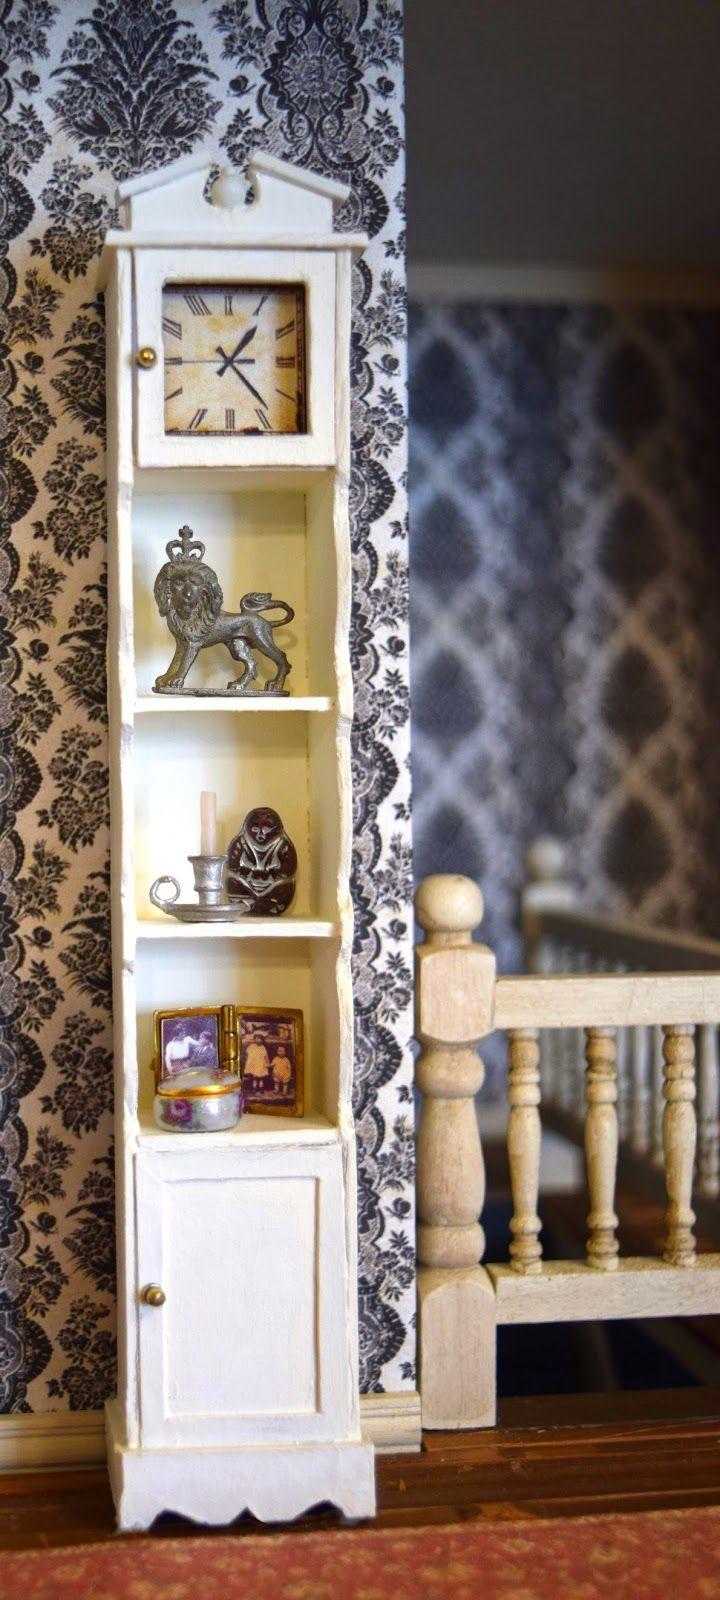 Miniature grandfather clock shelf | Nature's Soul Miniatures